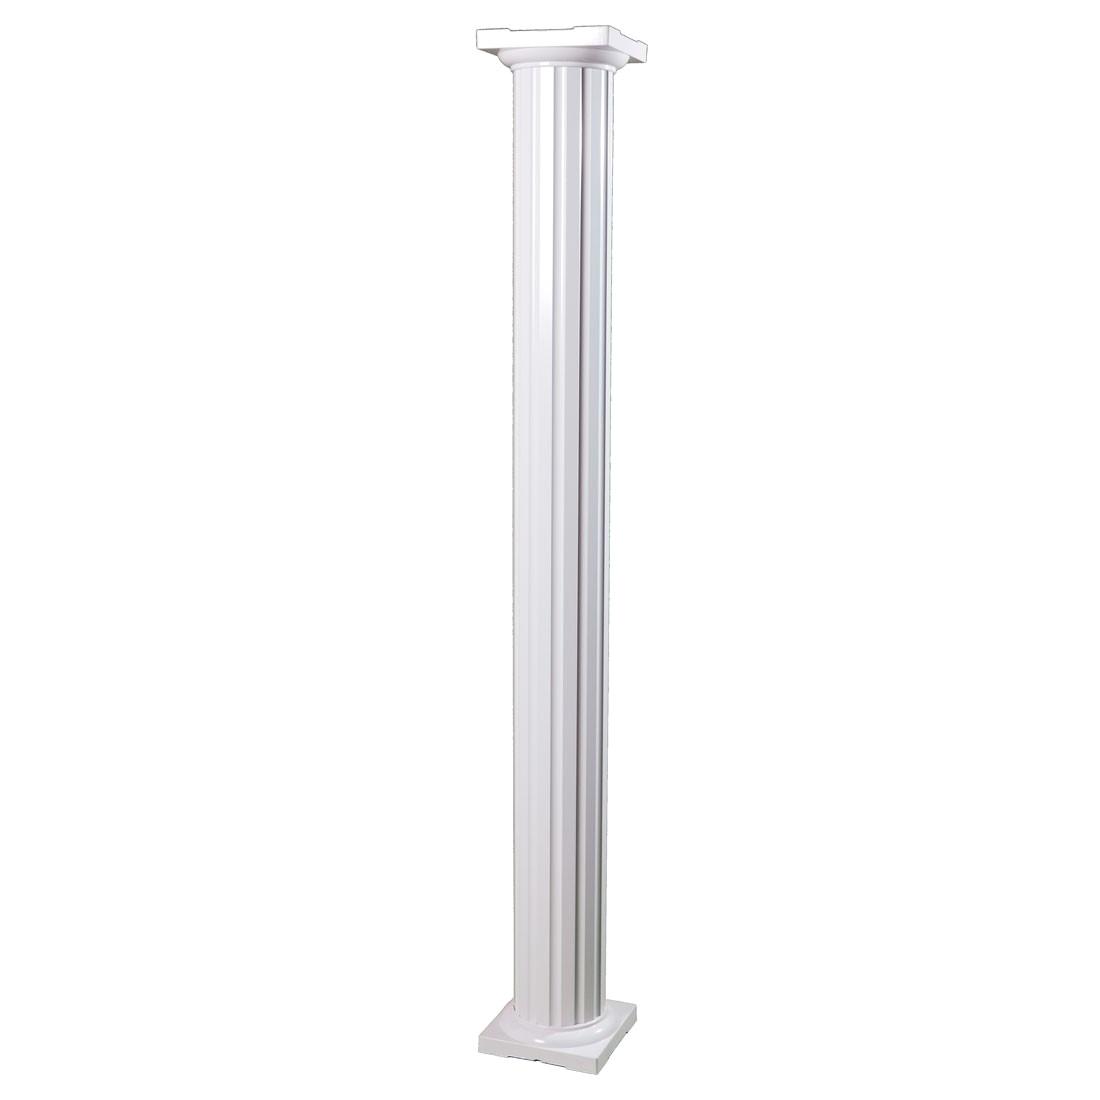 round fluted aluminum column standard cap base option